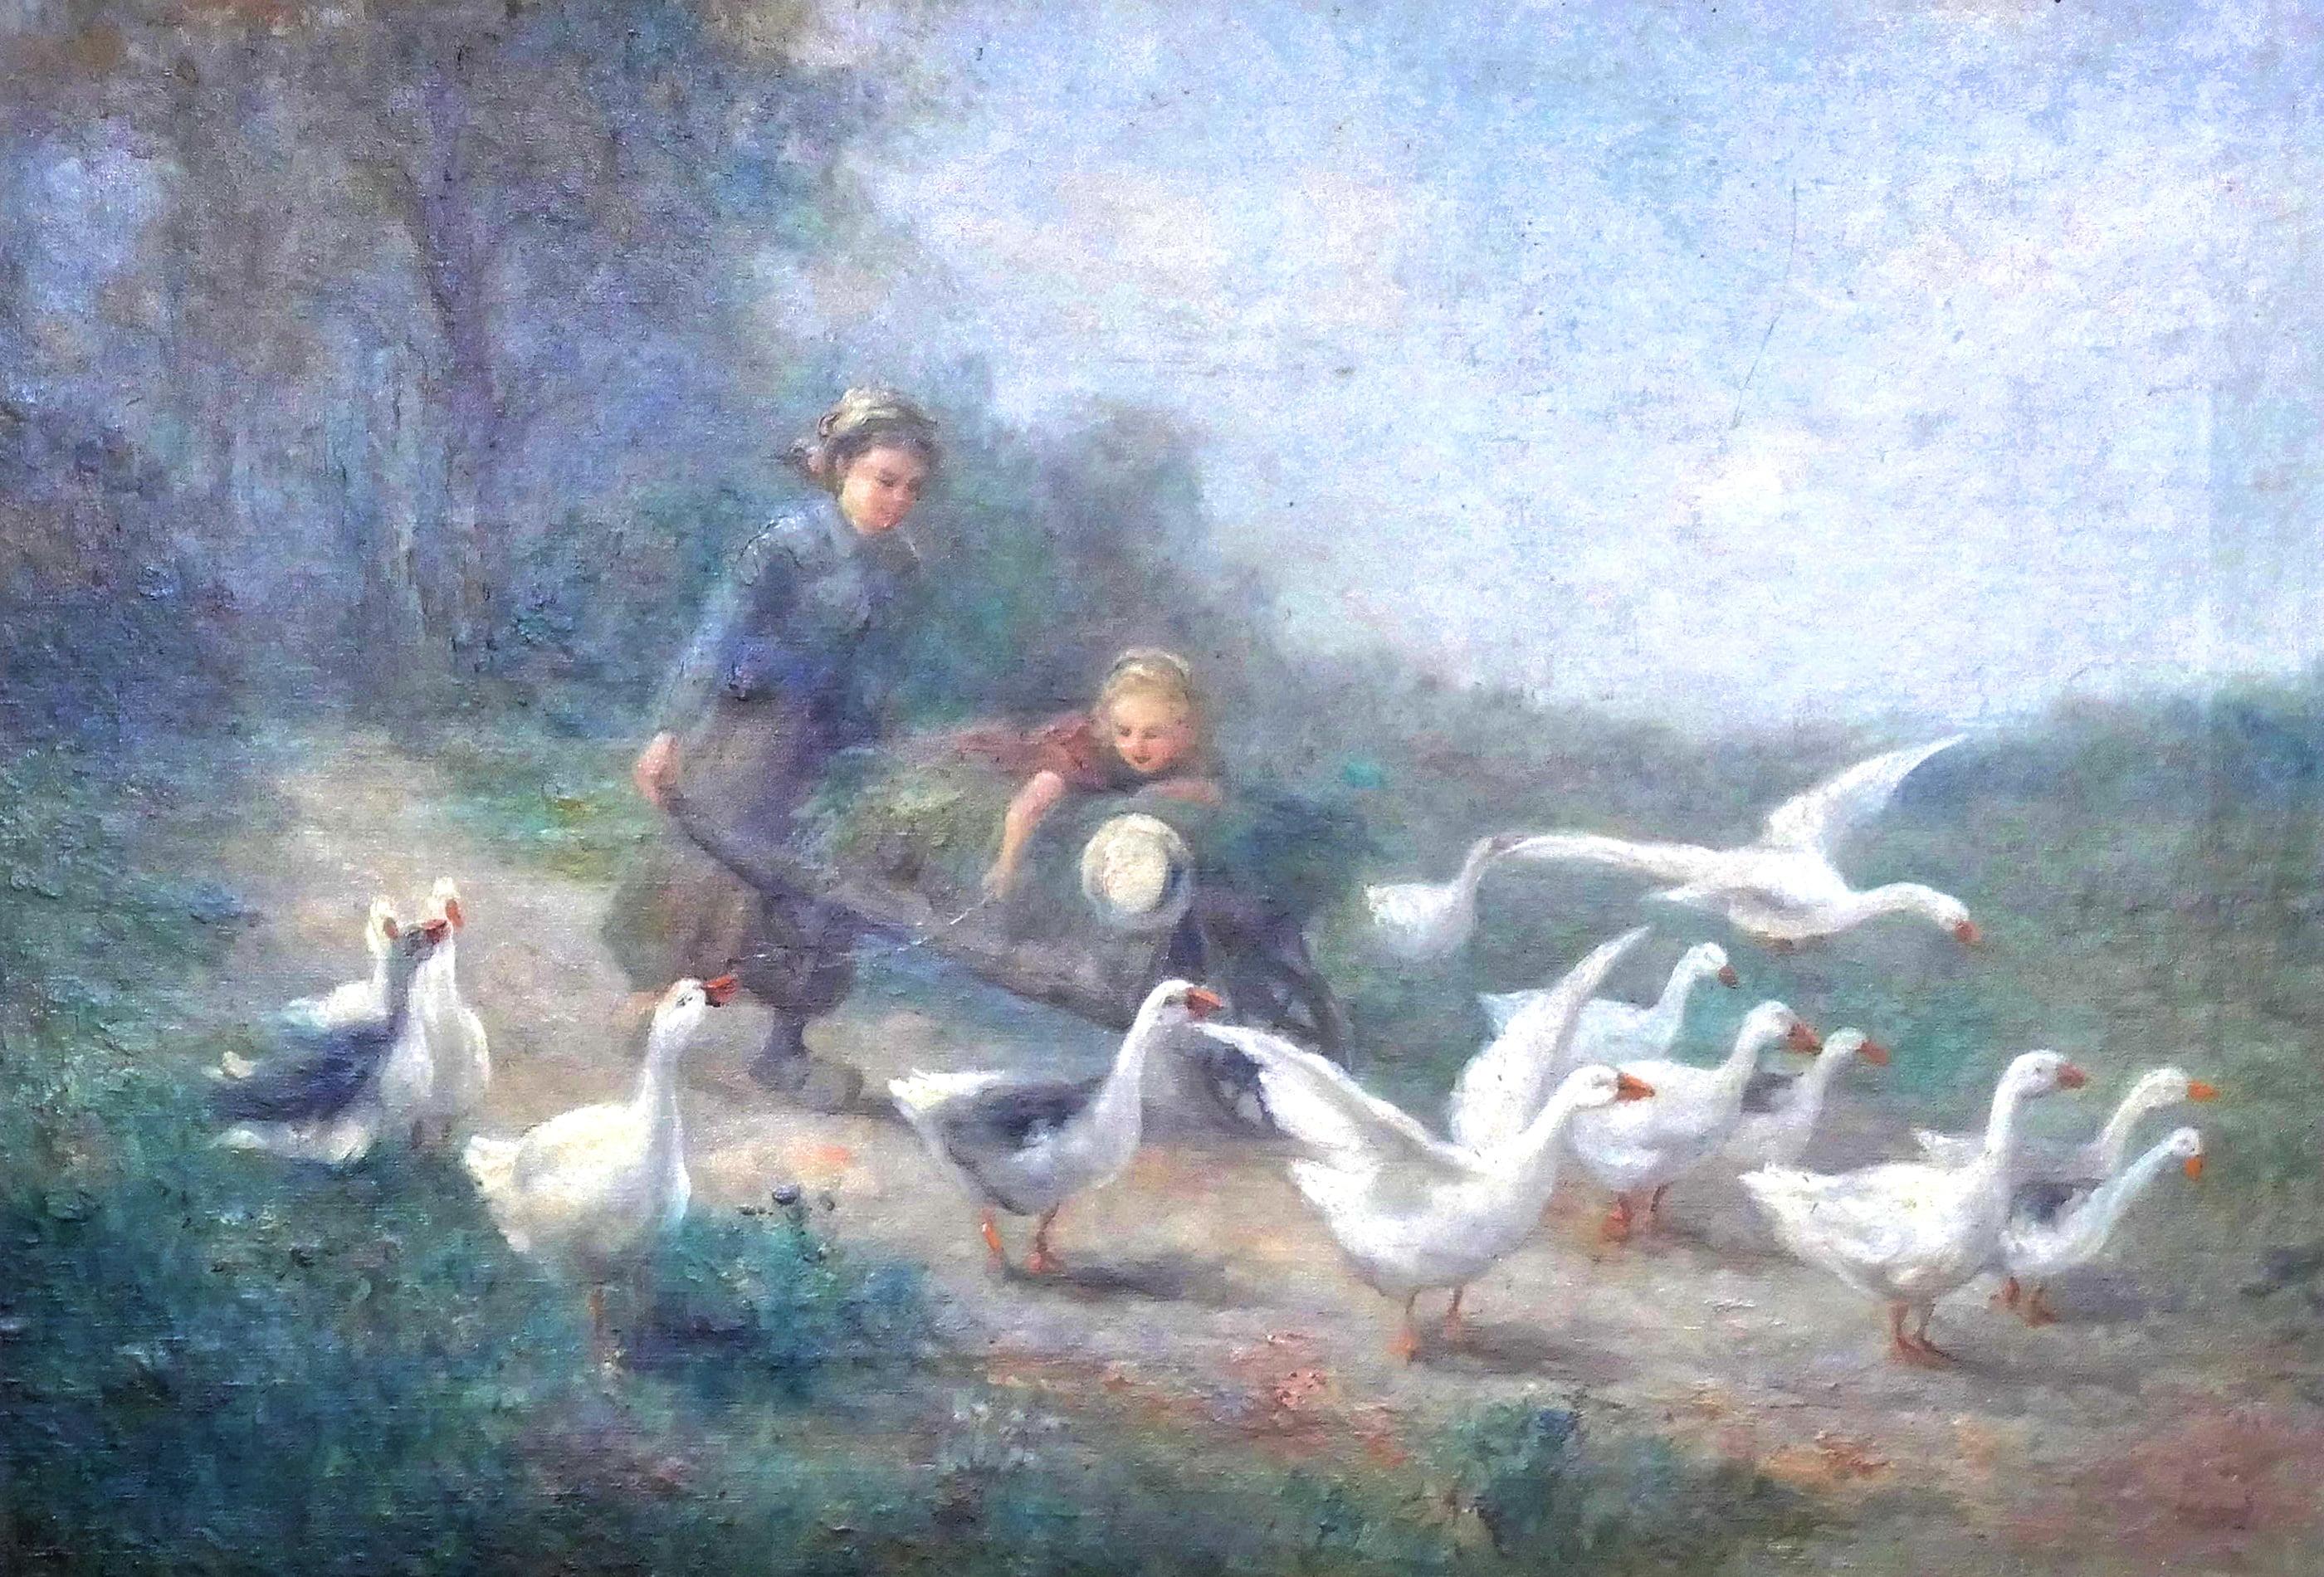 07. Two Girls Herding Geese